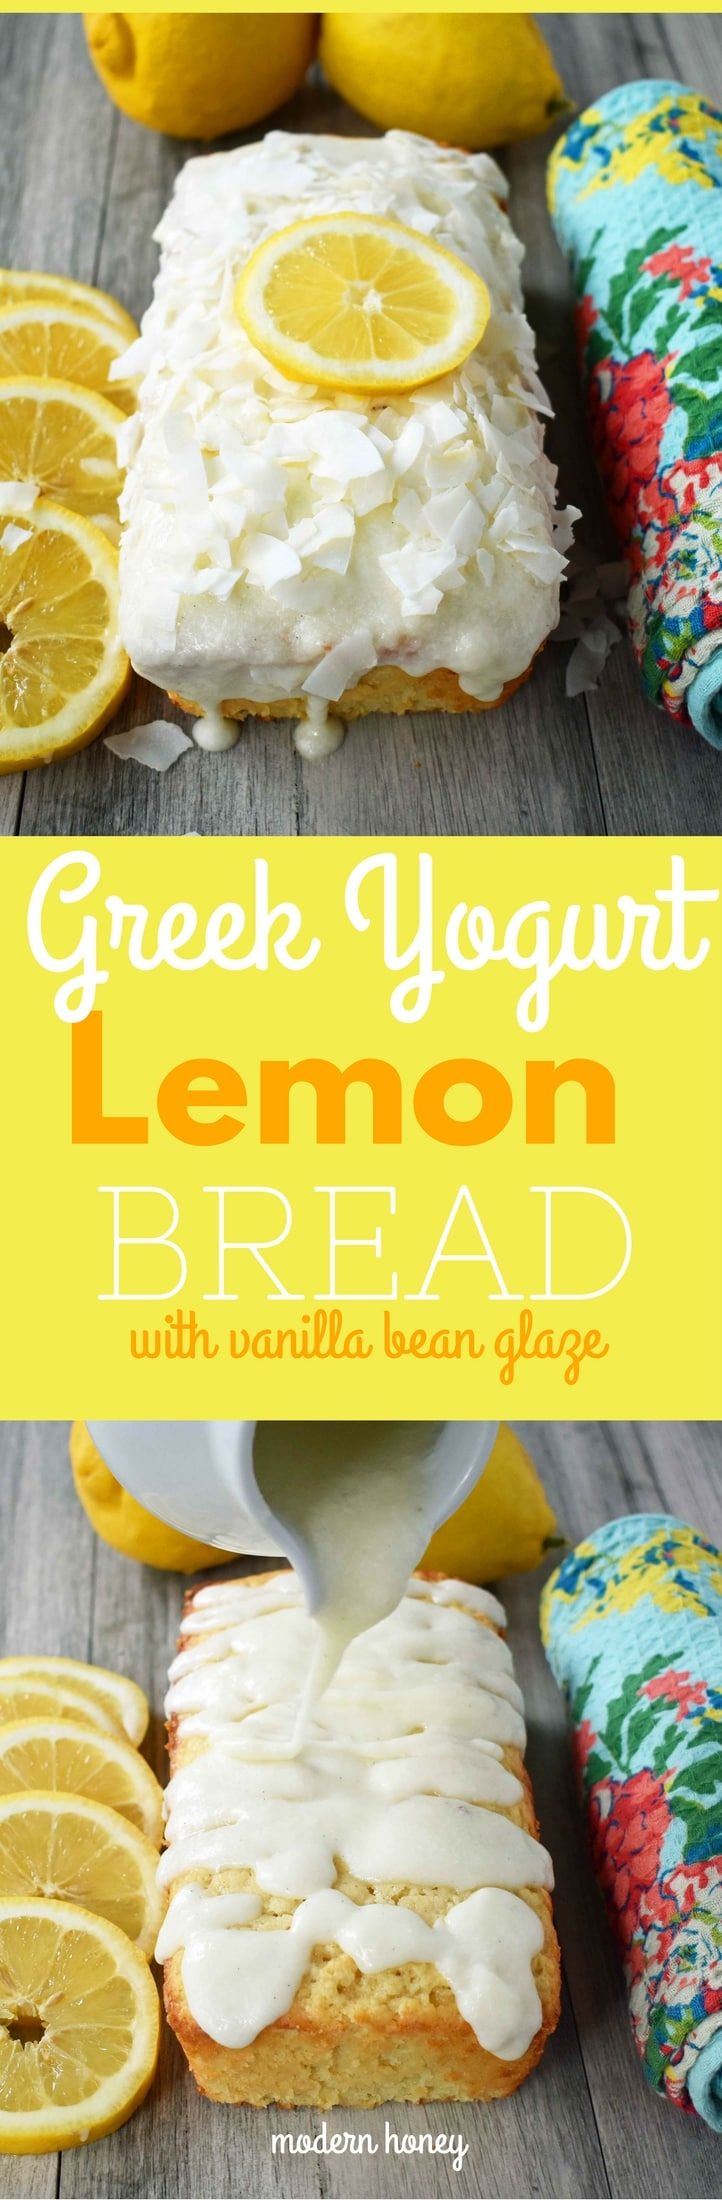 Greek Yogurt Lemon Bread with Vanilla Bean Glaze and Coconut. Sweet and moist lemon yogurt cake topped with creamy vanilla glaze. www.modernhoney.com